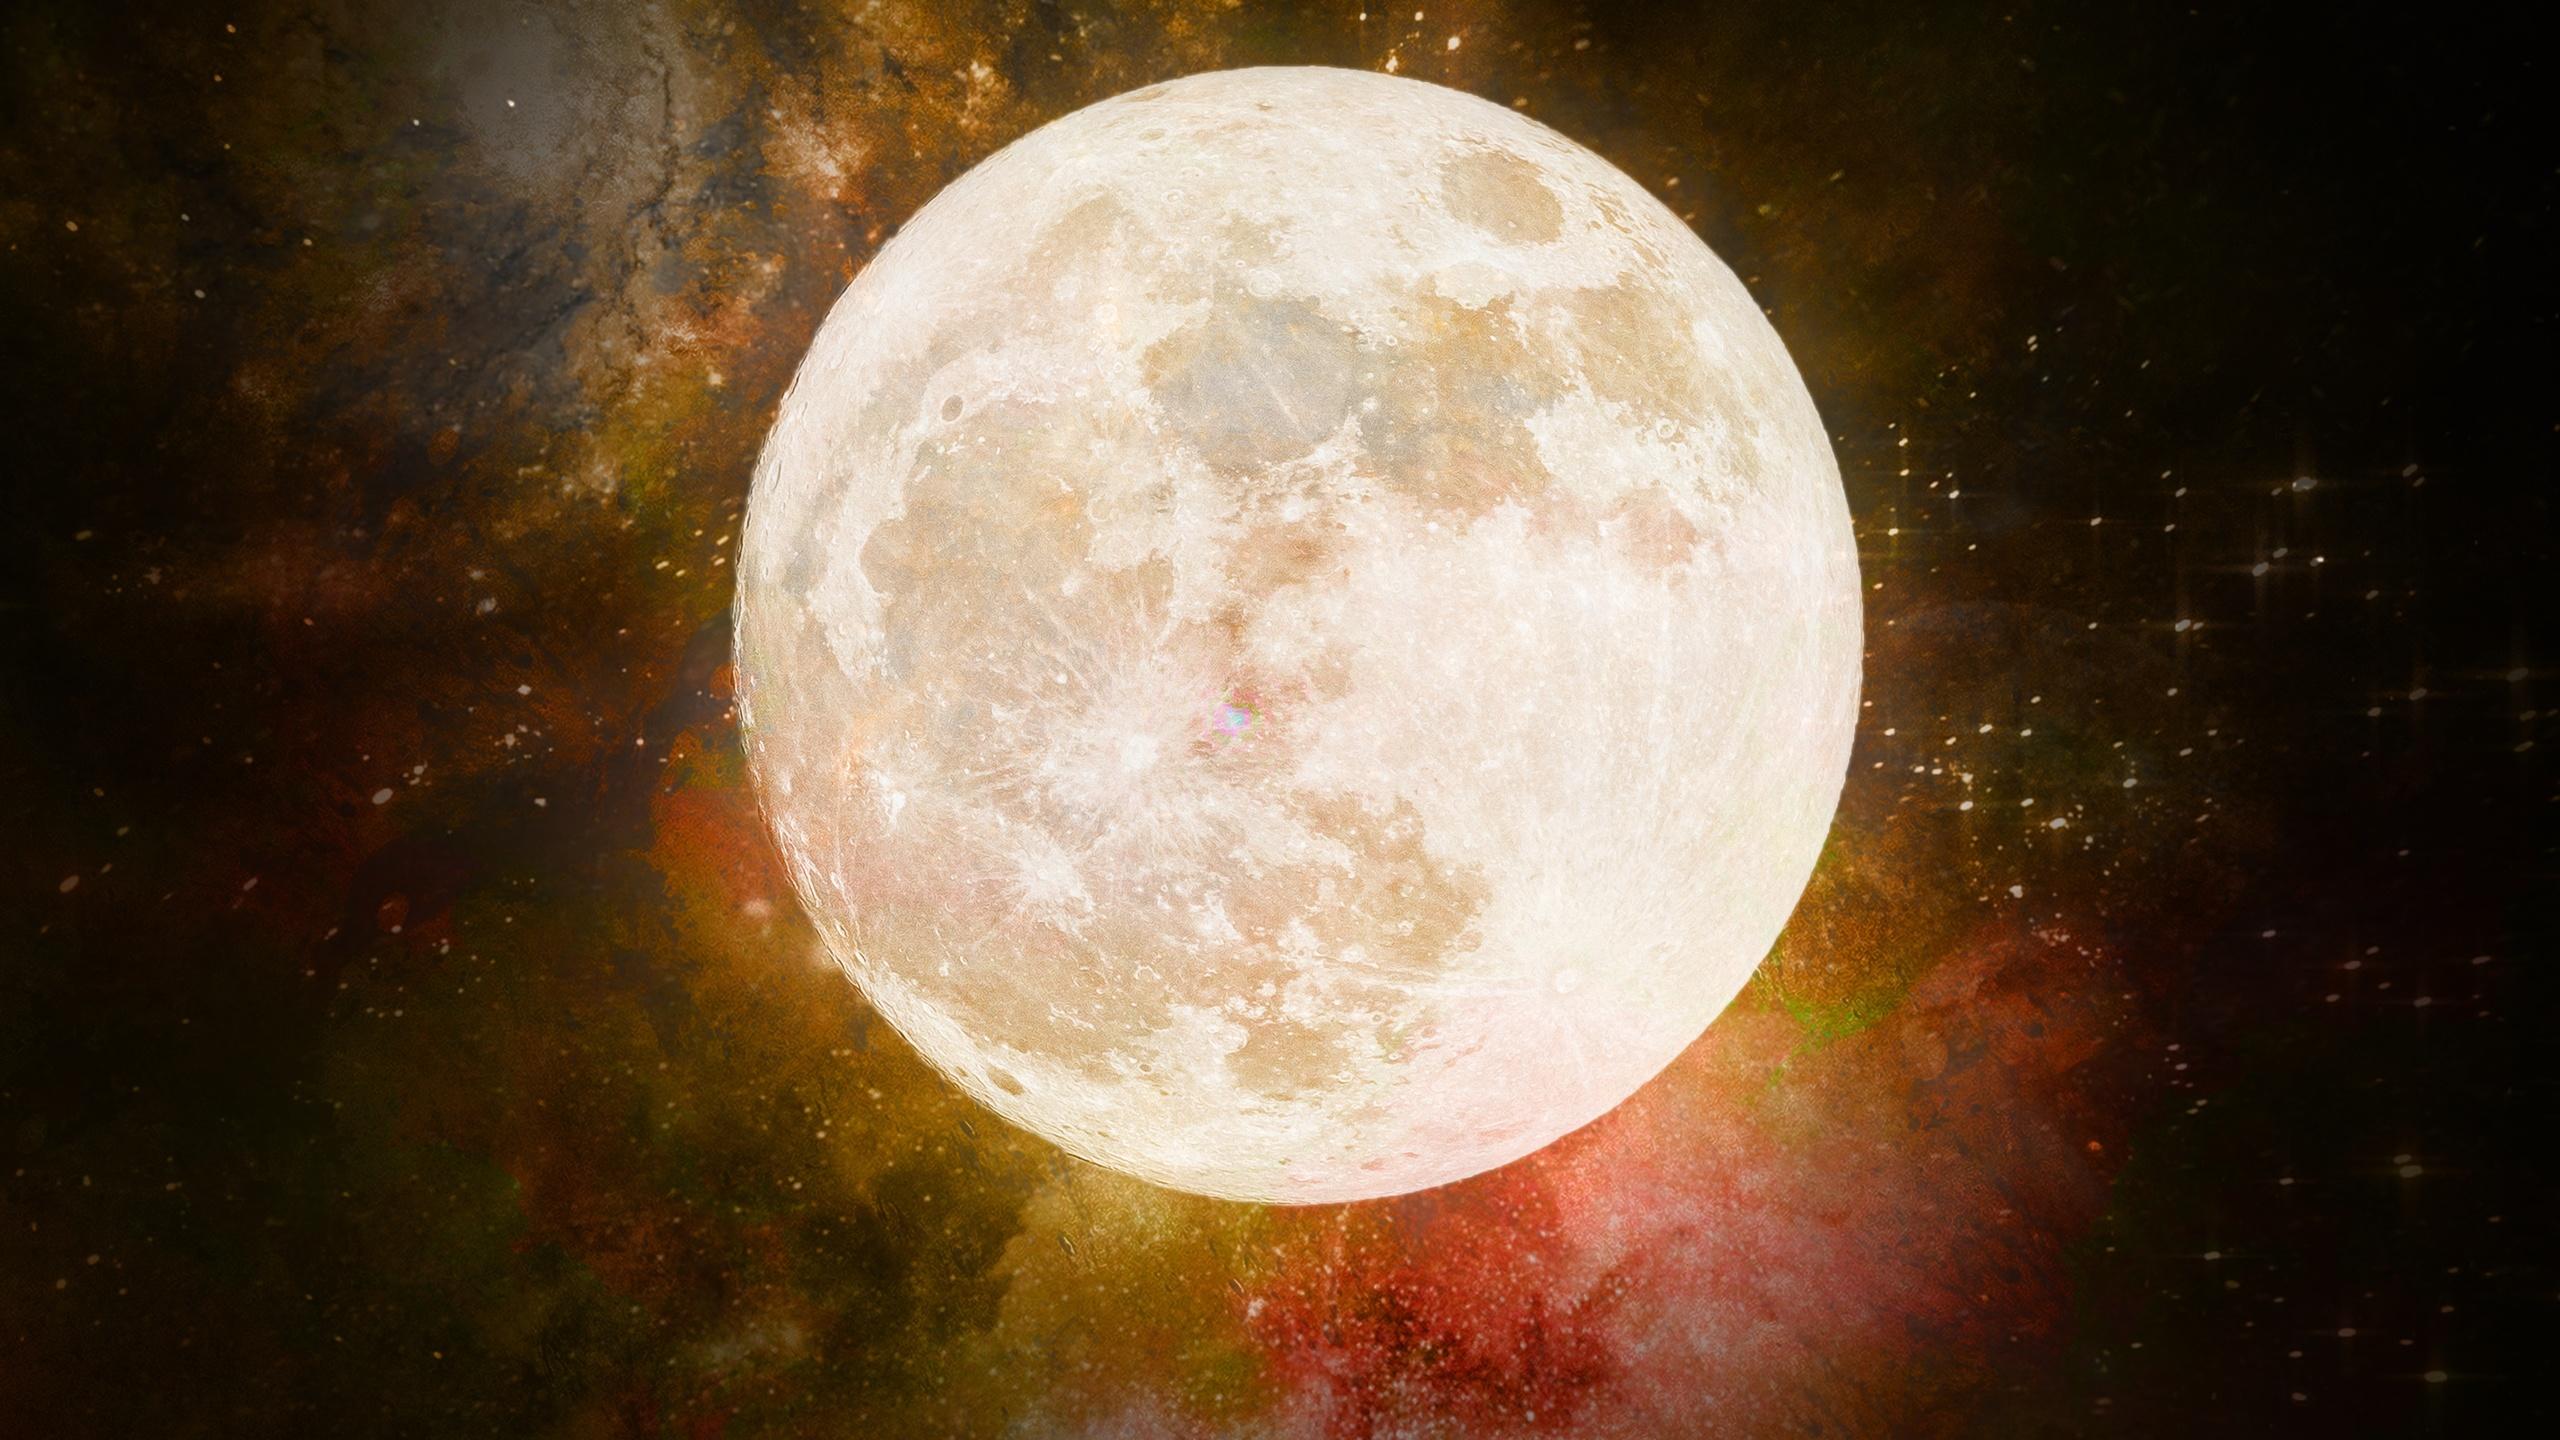 луна, галактика, космос